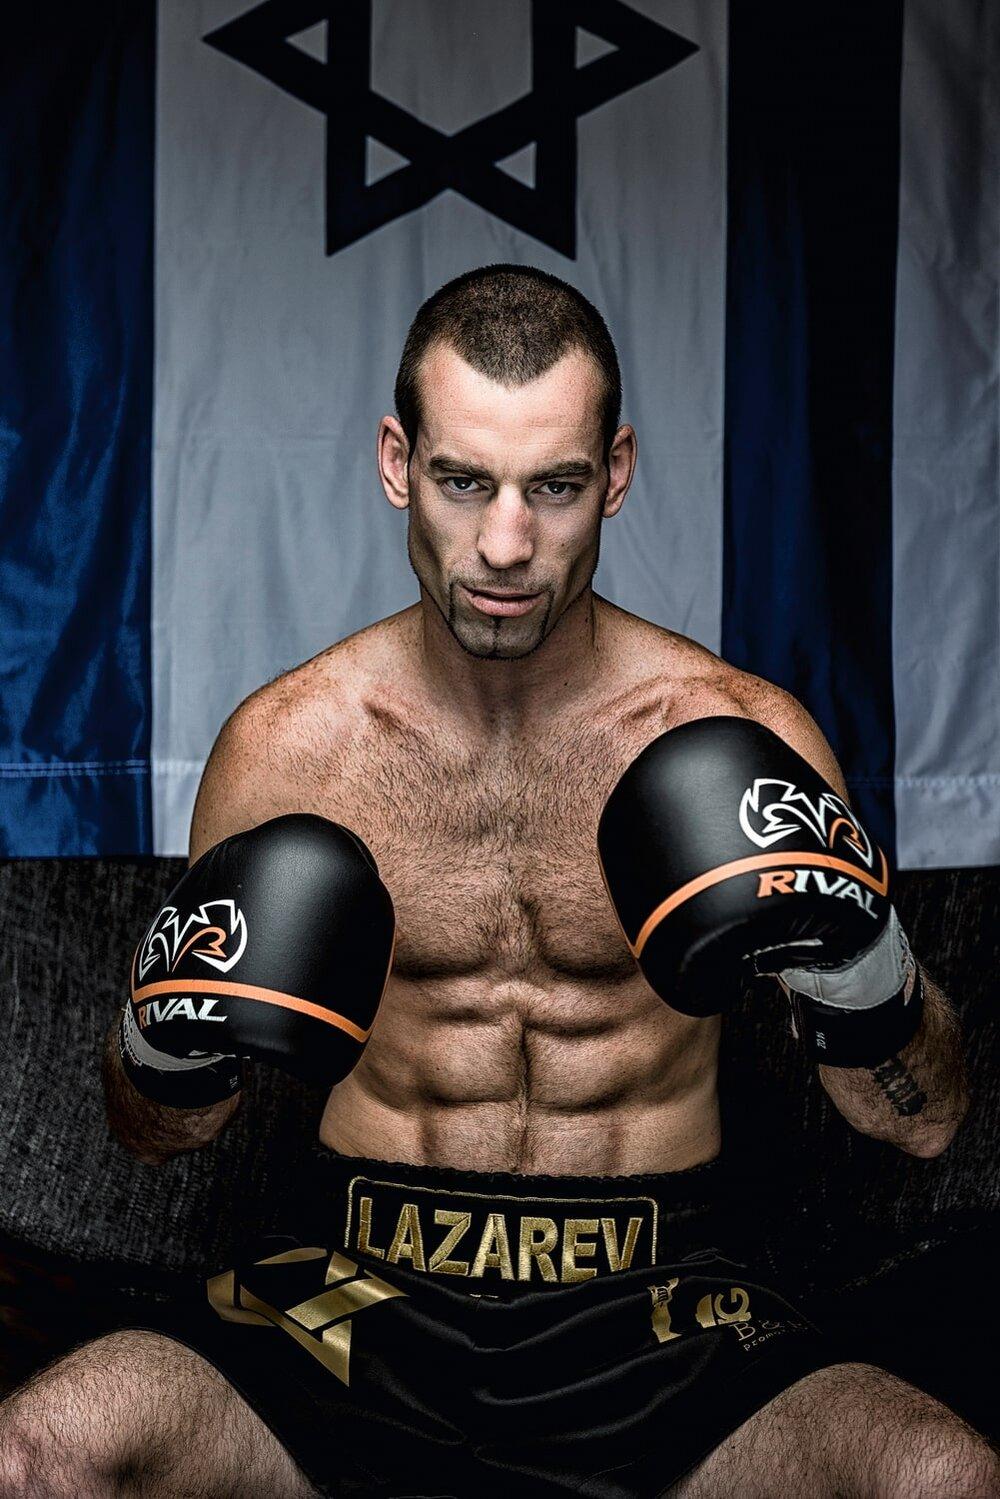 Igor Lazarev צילום פורטרט של המתאגרף איגור לזרב